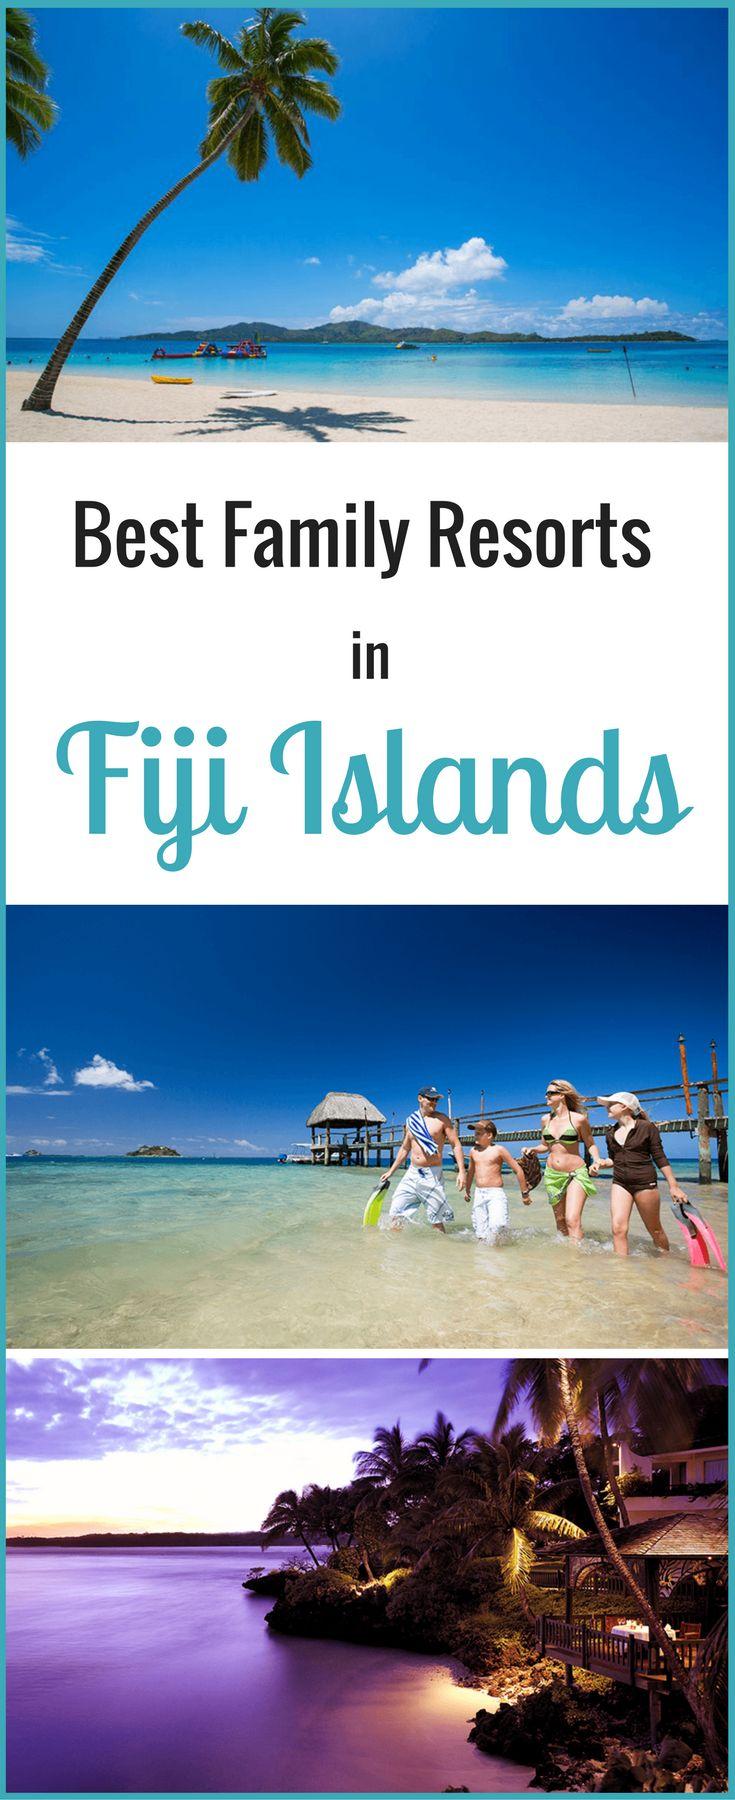 Best family resorts in Fiji. Planning a Fiji family holiday? Need tips on where to stay in Fiji? Here are the 5 Best Family Resorts in Fiji for your family holiday to the Fijian Islands. FamilyTravel #Fiji